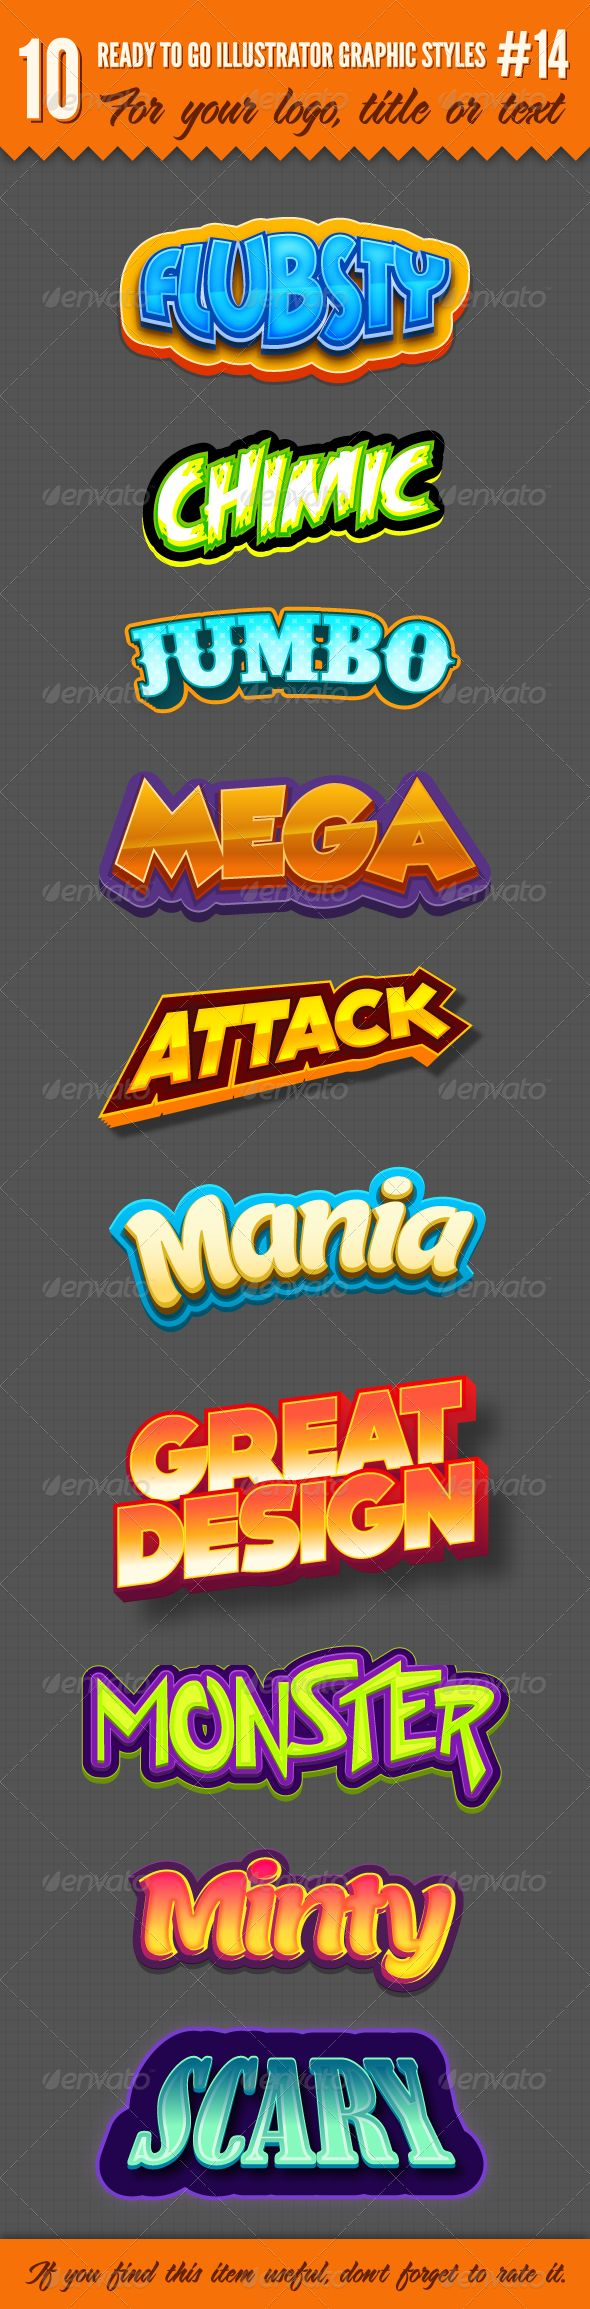 10 Logo Graphic Styles #14   GraphicRiver